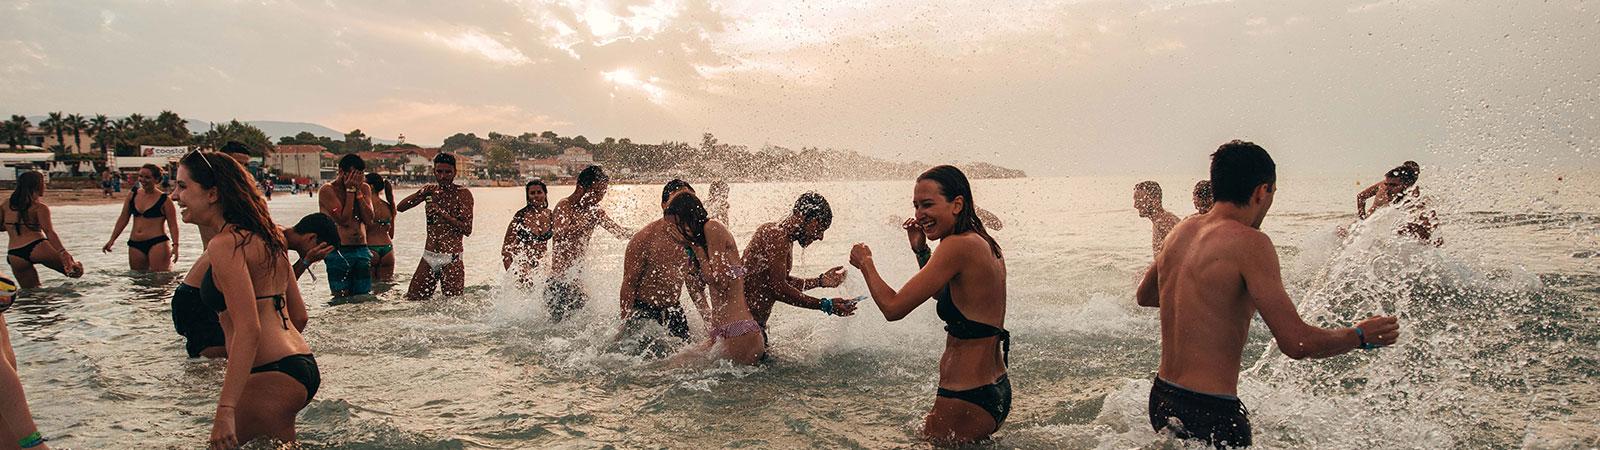 Beach Party nei Viaggi Evento a Zante